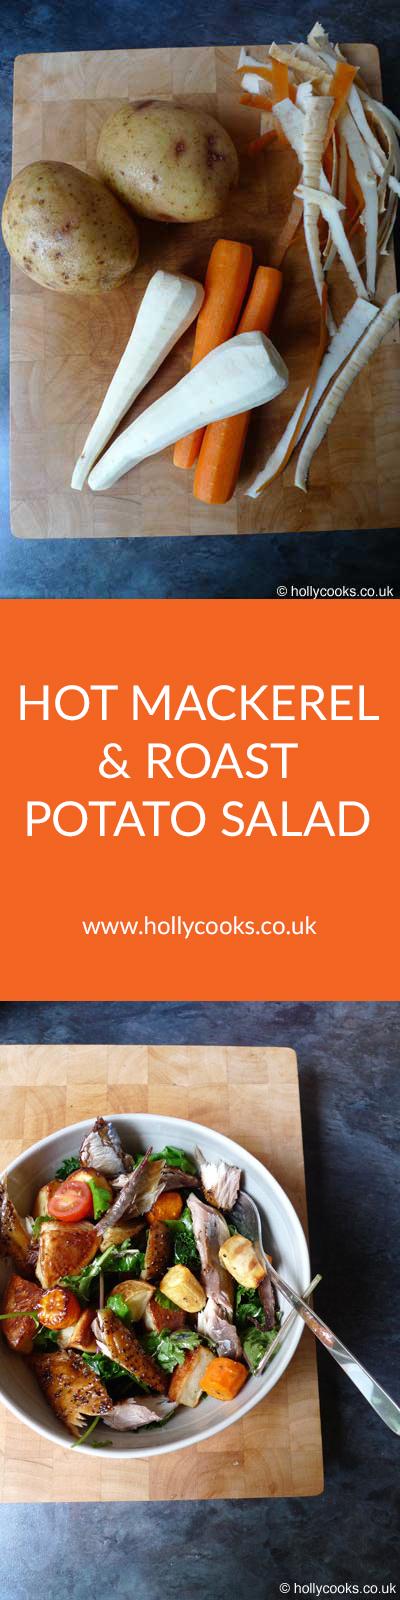 Holly-cooks-hot-mackerel-and-roast-potato-salad-pinterest